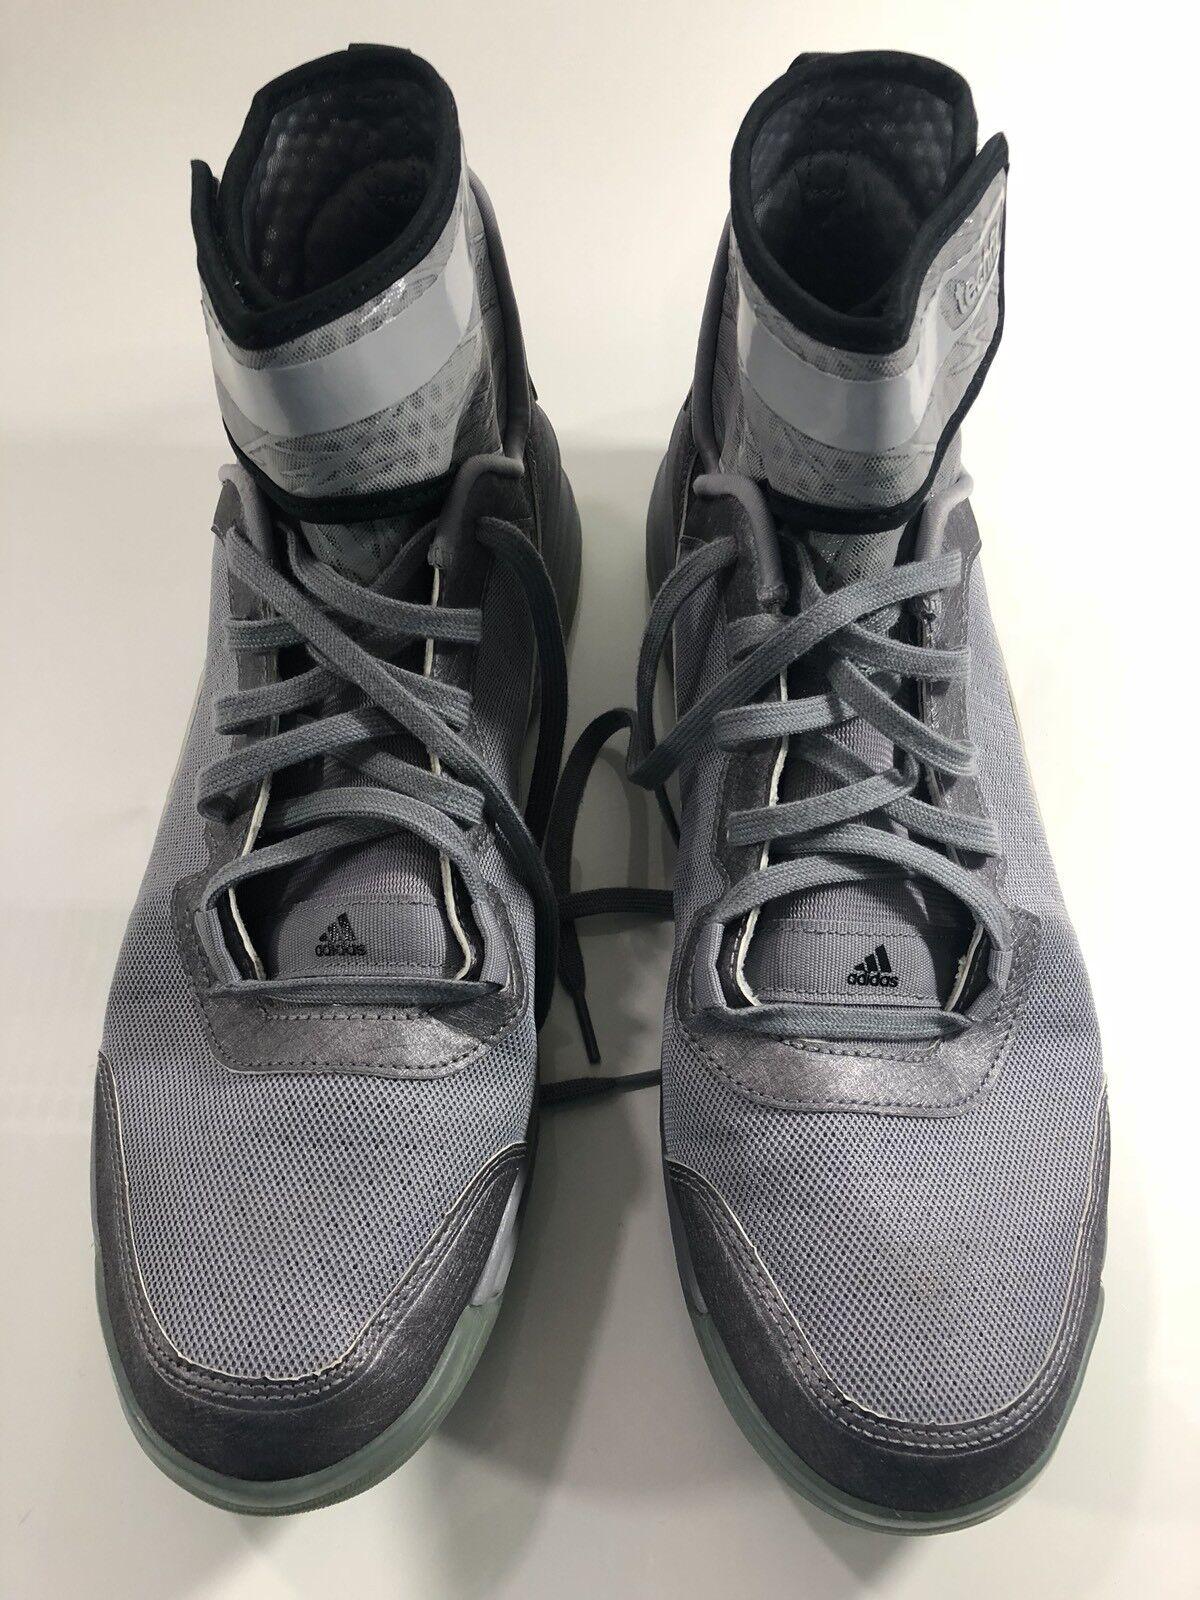 d97edeae909bfe Adidas Adiprene Techfit Dual Thread Basketball Basketball Basketball Mens  Shoes Gray 13 Preowned 7dd503